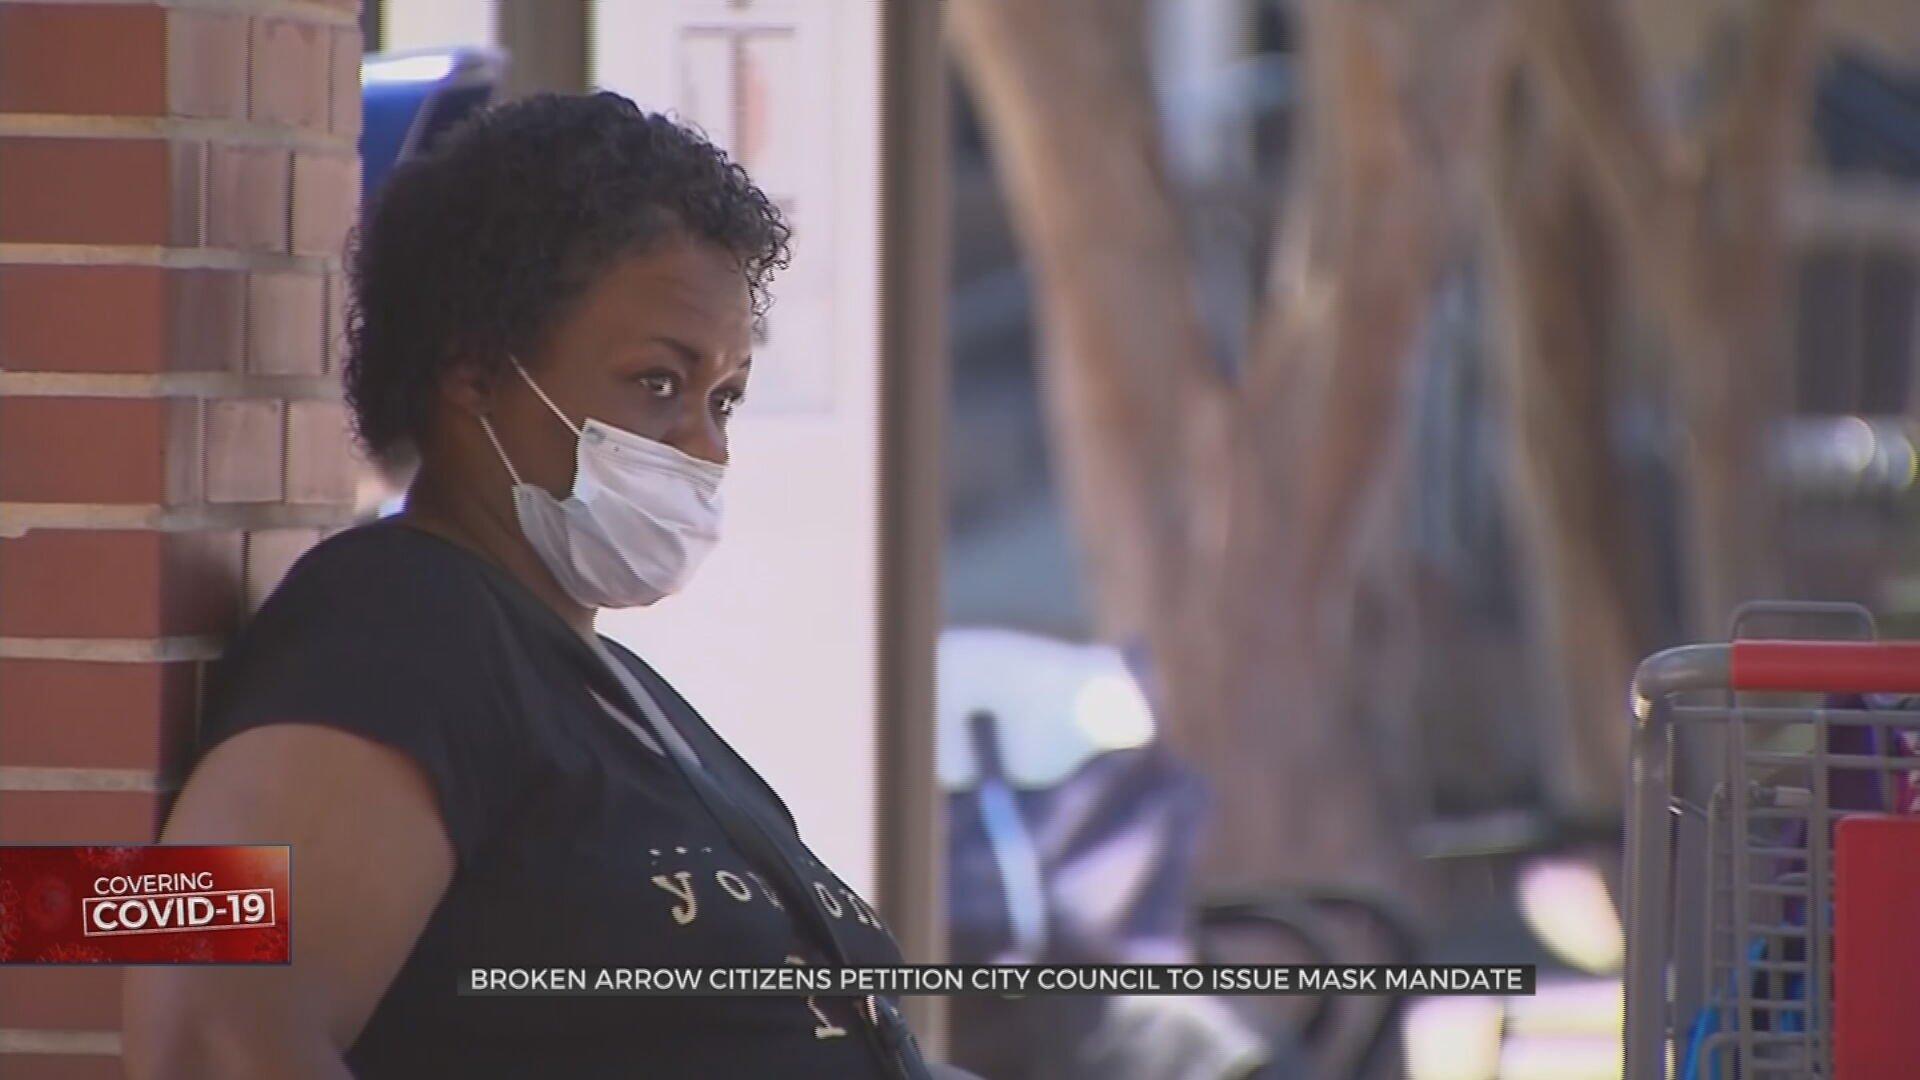 Hundreds Of Broken Arrow Citizens Petition City Council For Mask Ordinance